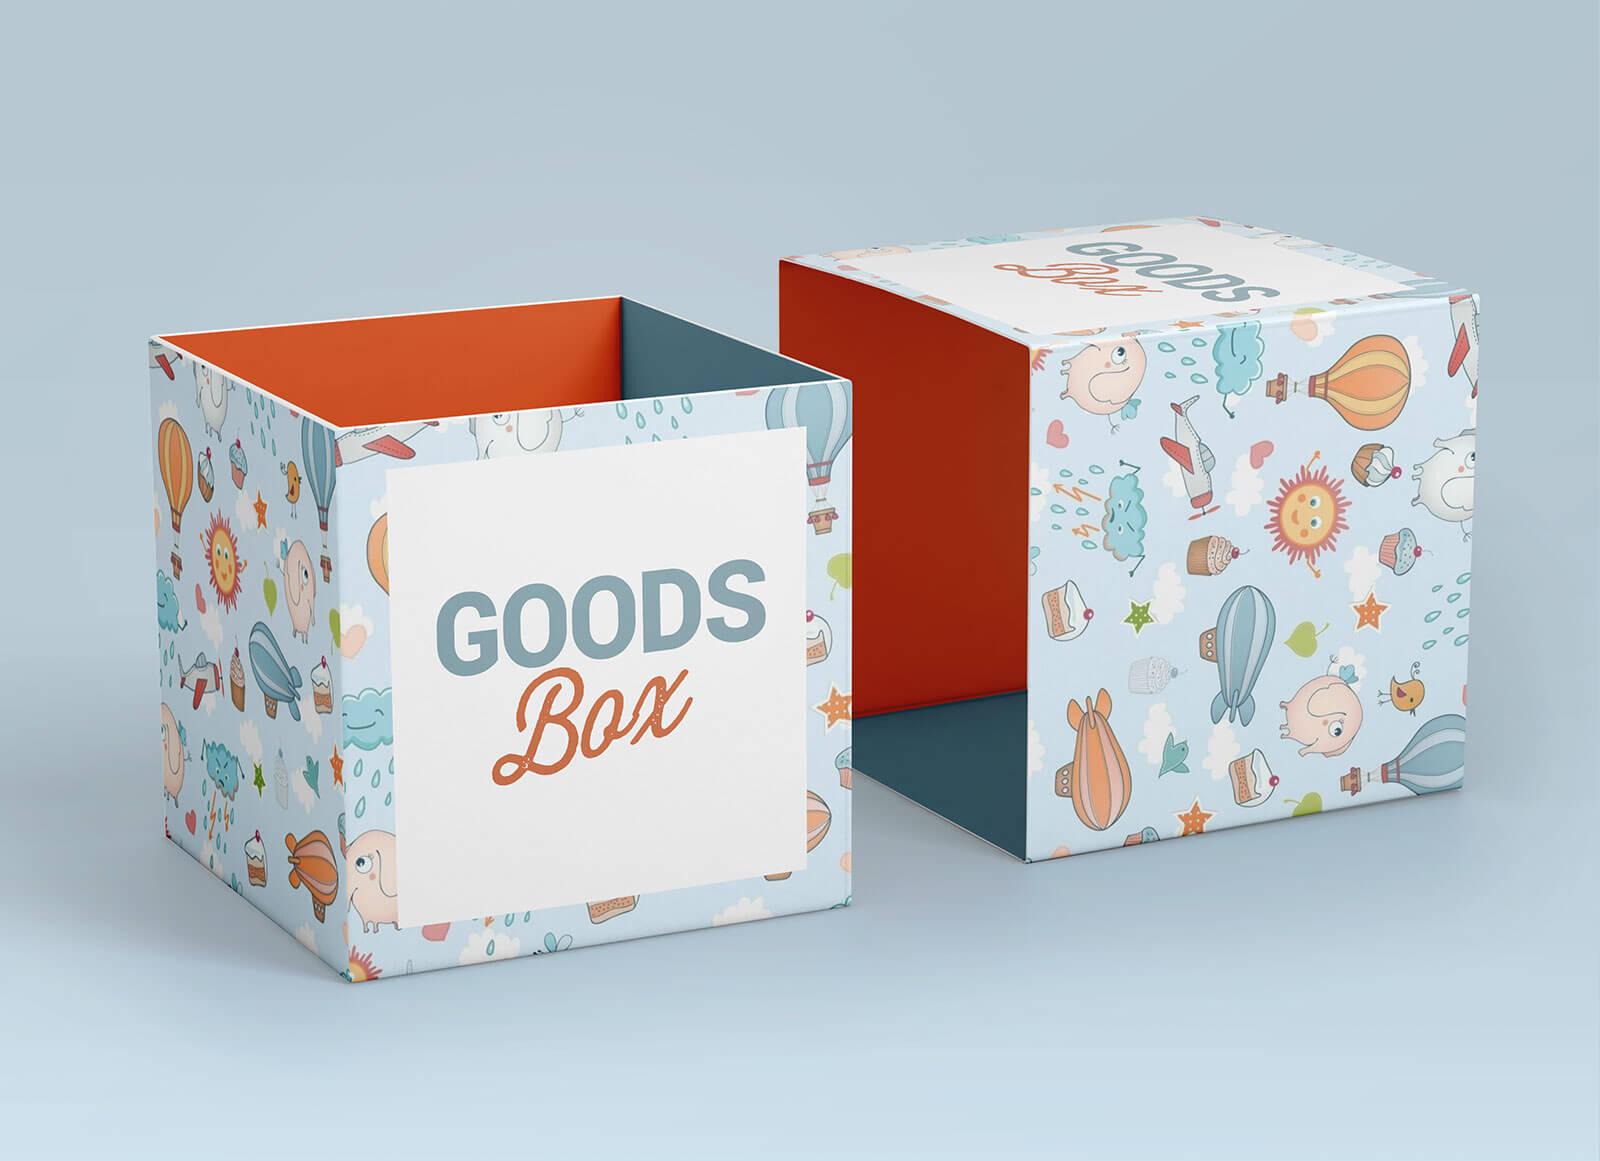 Free-Goods-Box-Mockup-PSD-Set-2